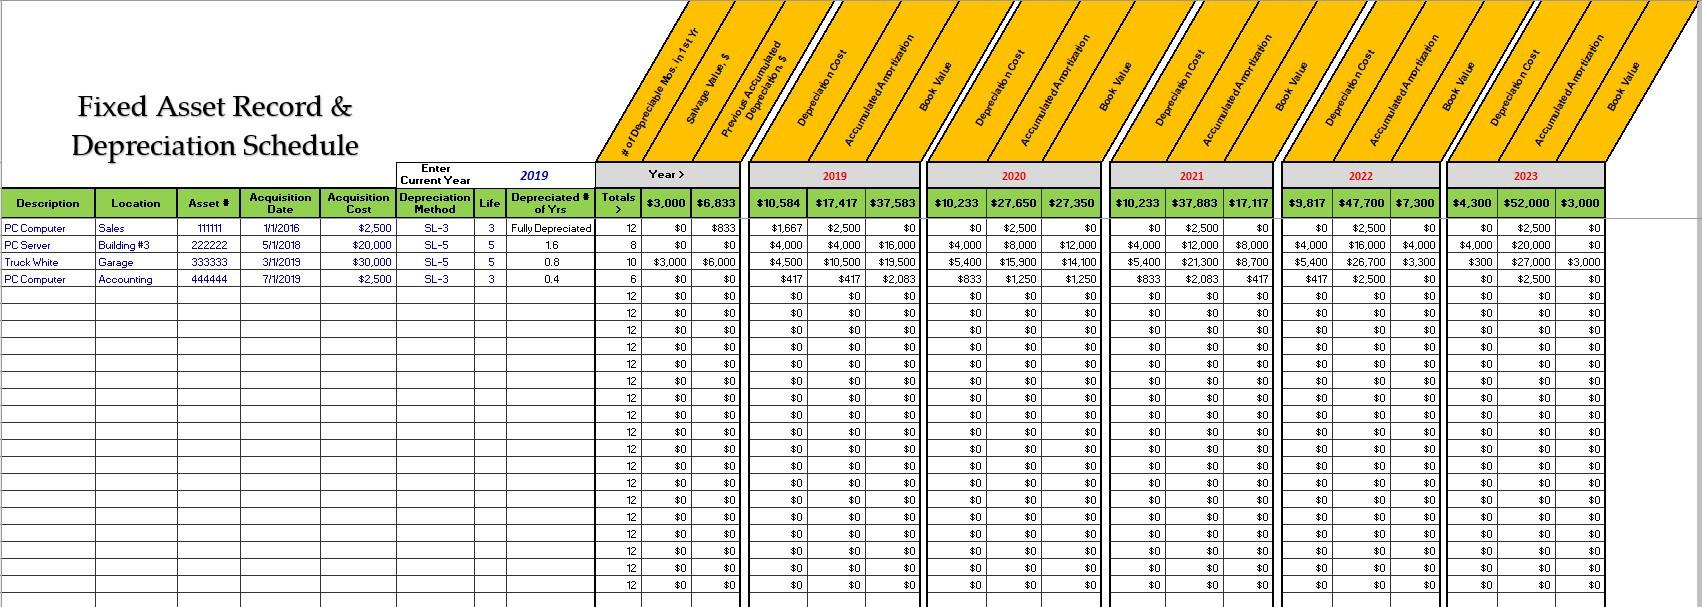 Fixed Assets & Depreciation Schedule .jp